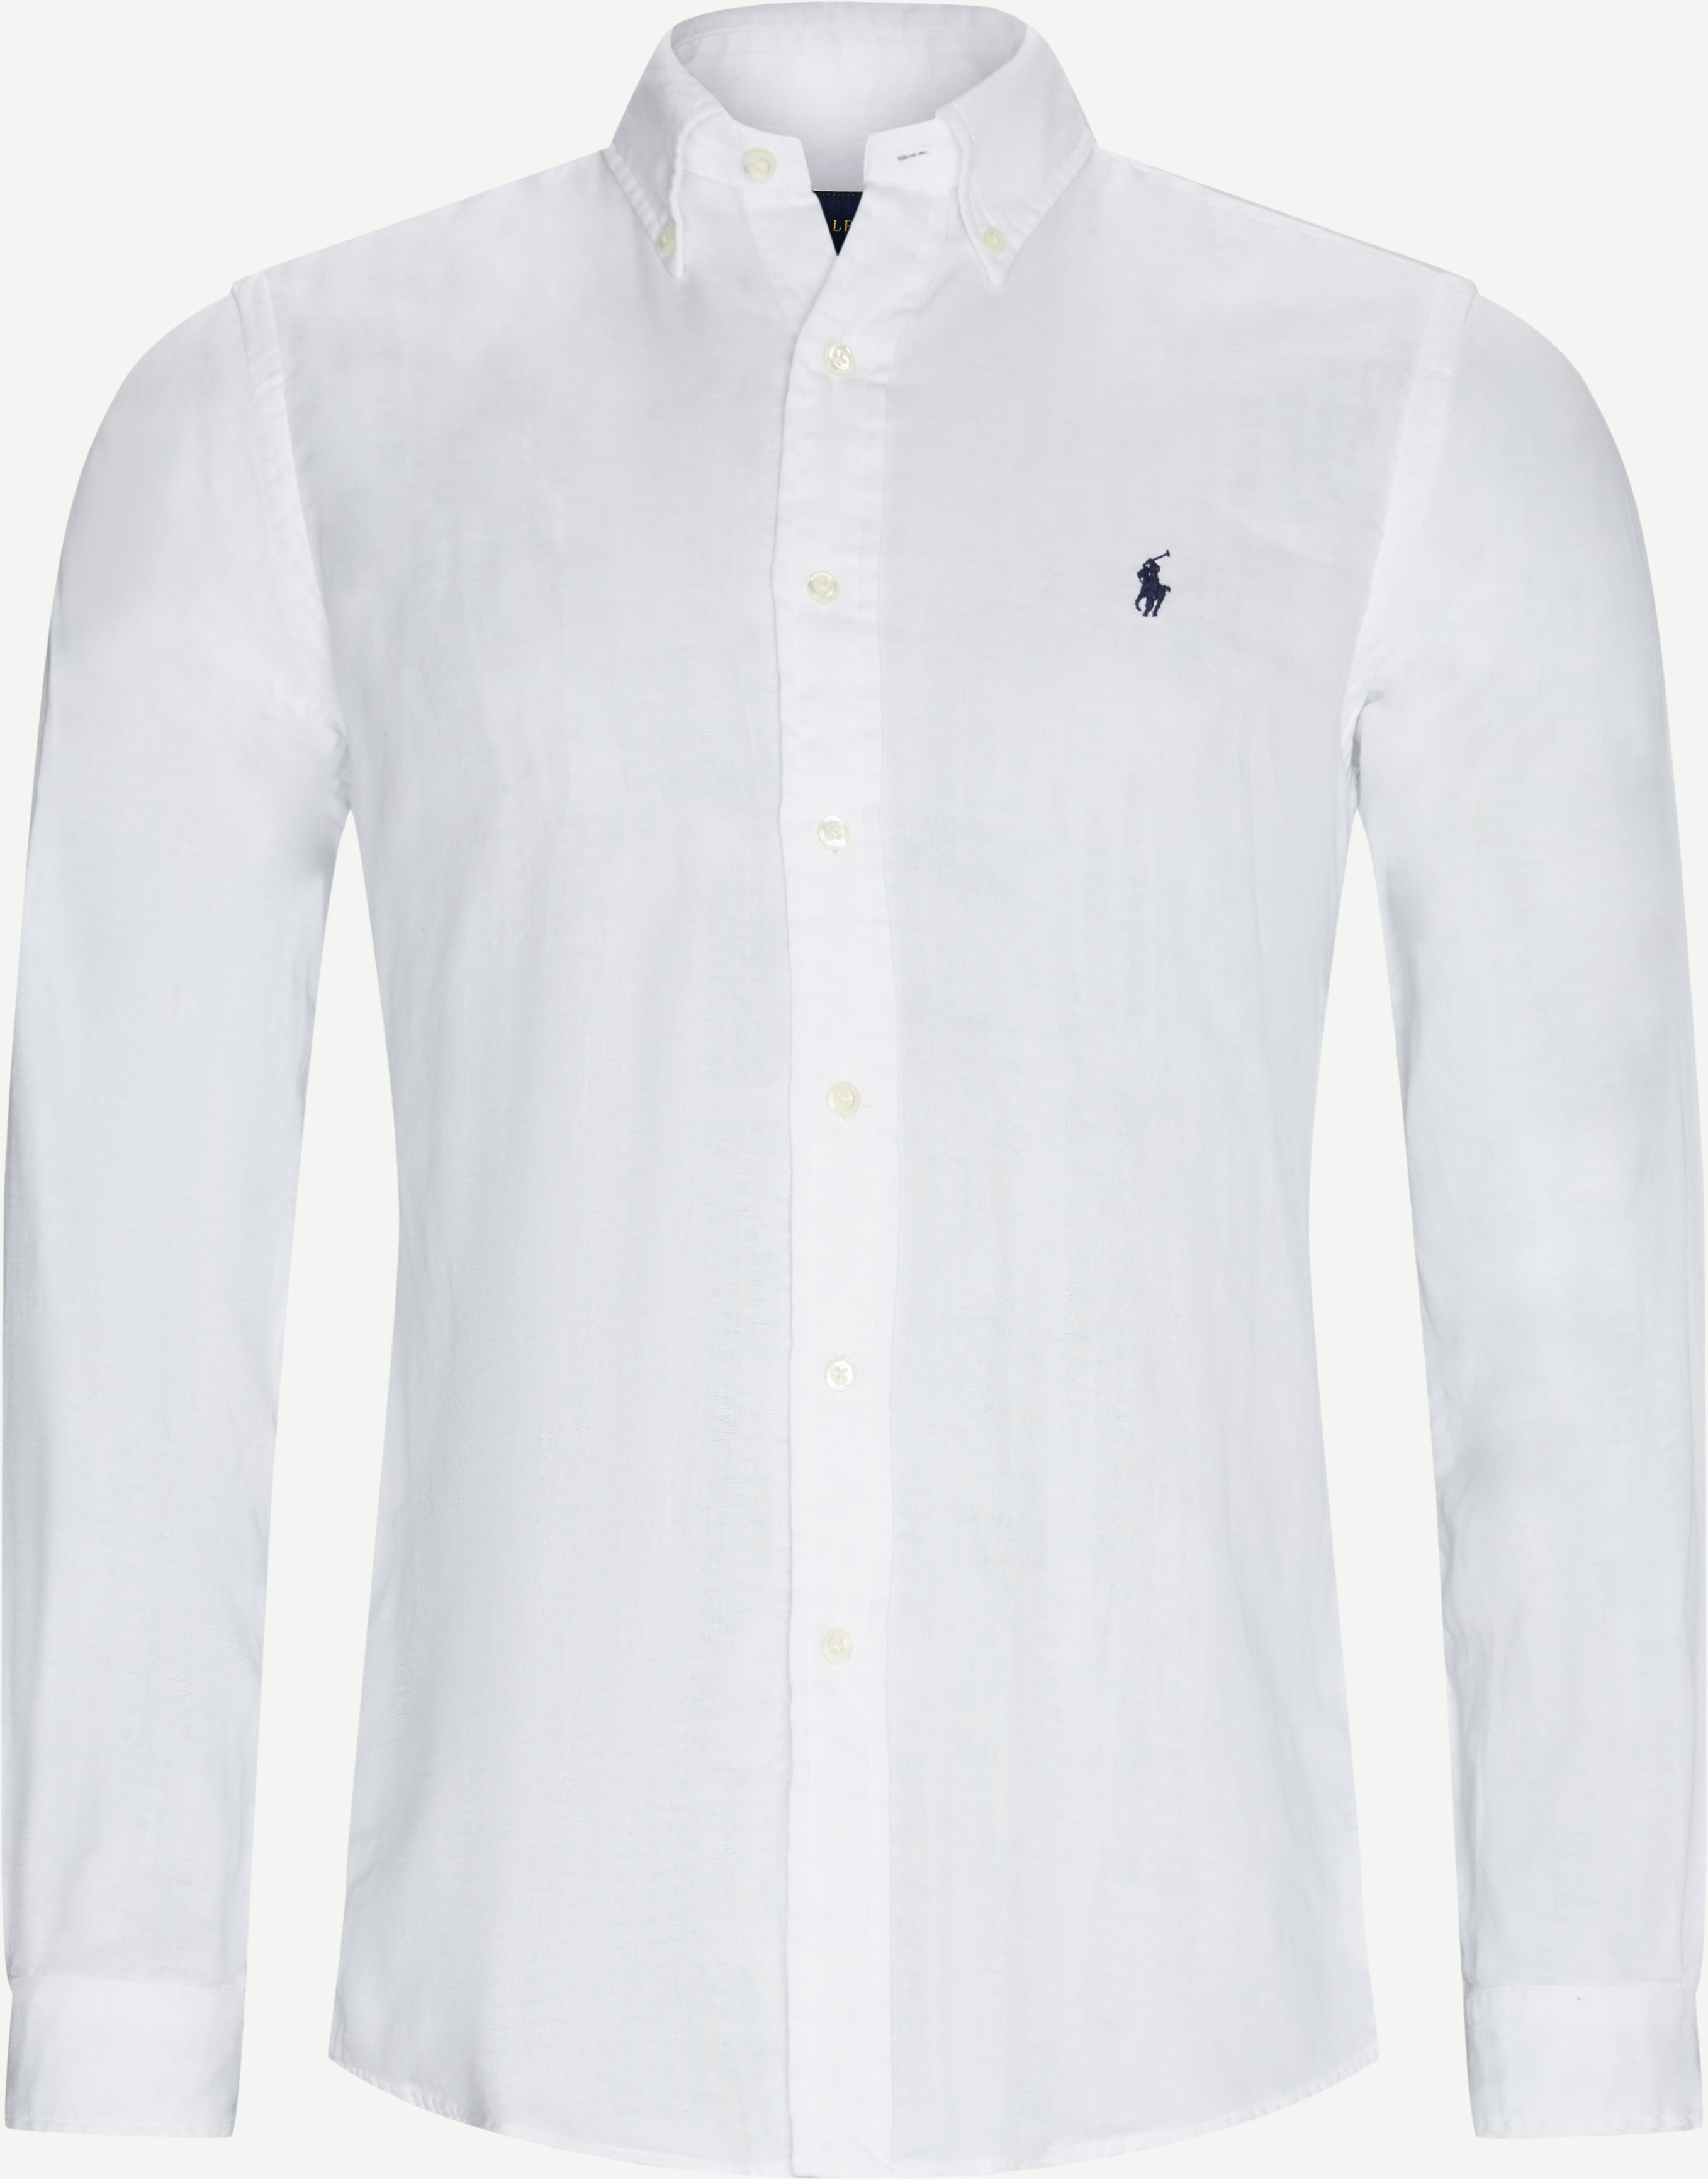 Shirts - Custom fit - White